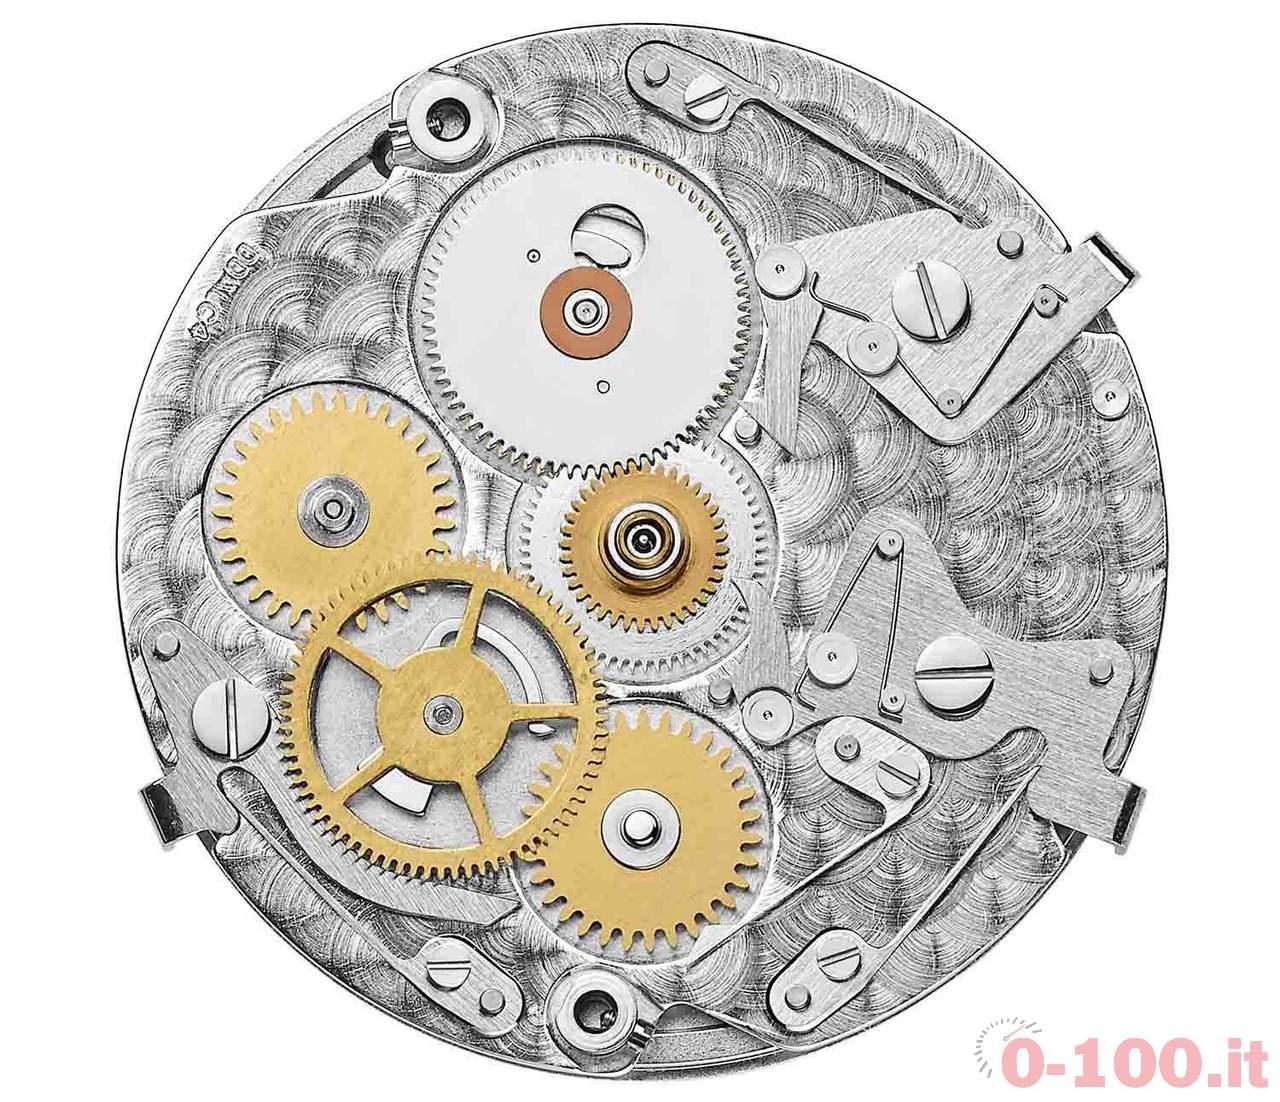 girard-perregaux-1966-dual-time-ref-49544-52-131-bbb0-ref-49544-52-231-bb60-prezzo-price-0-100_8